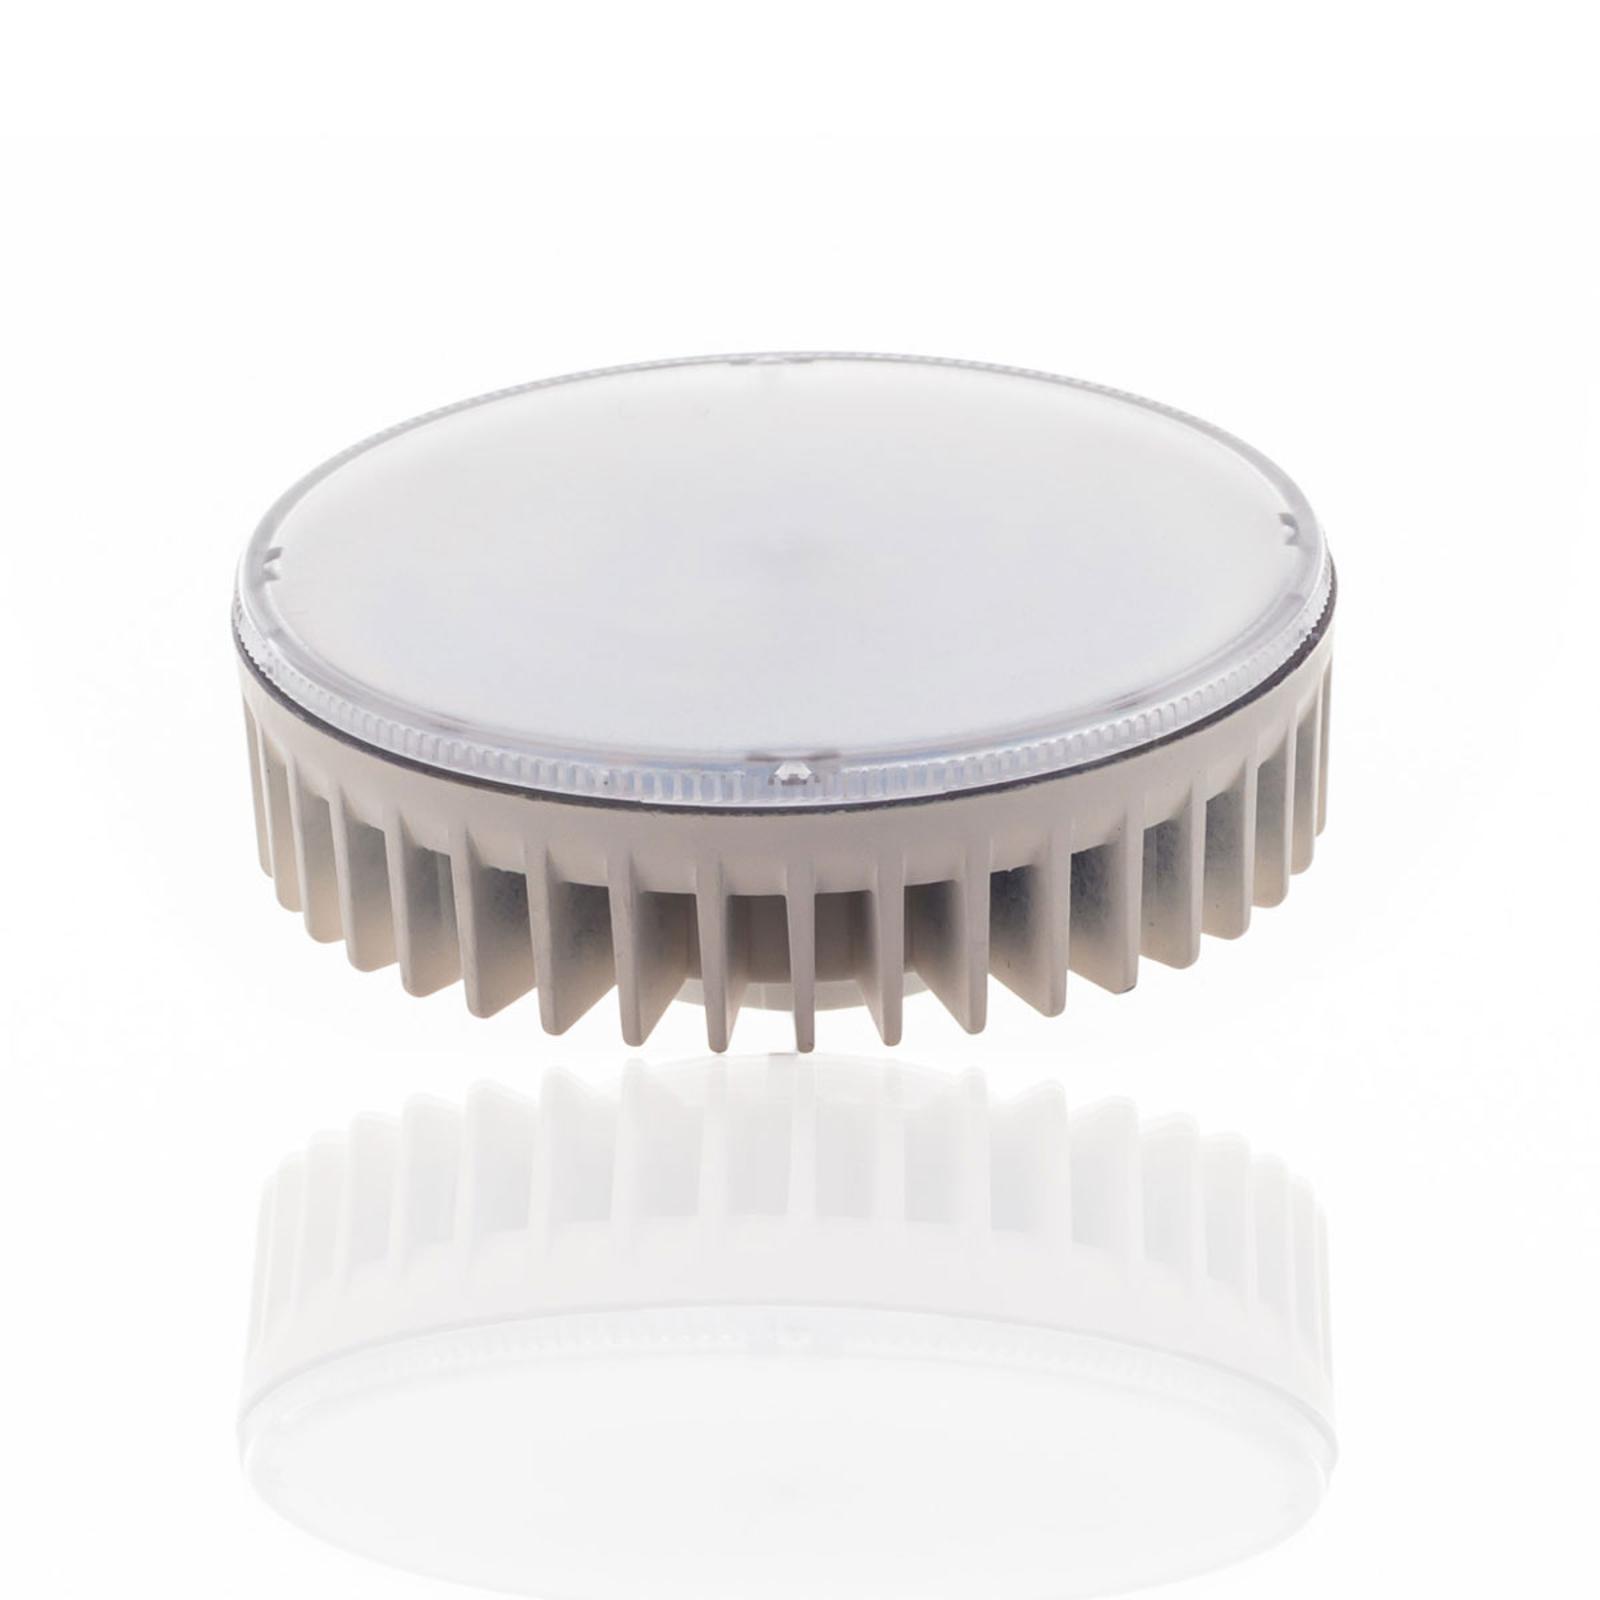 GX53 7W lampadina LED da 800lm - bianco caldo